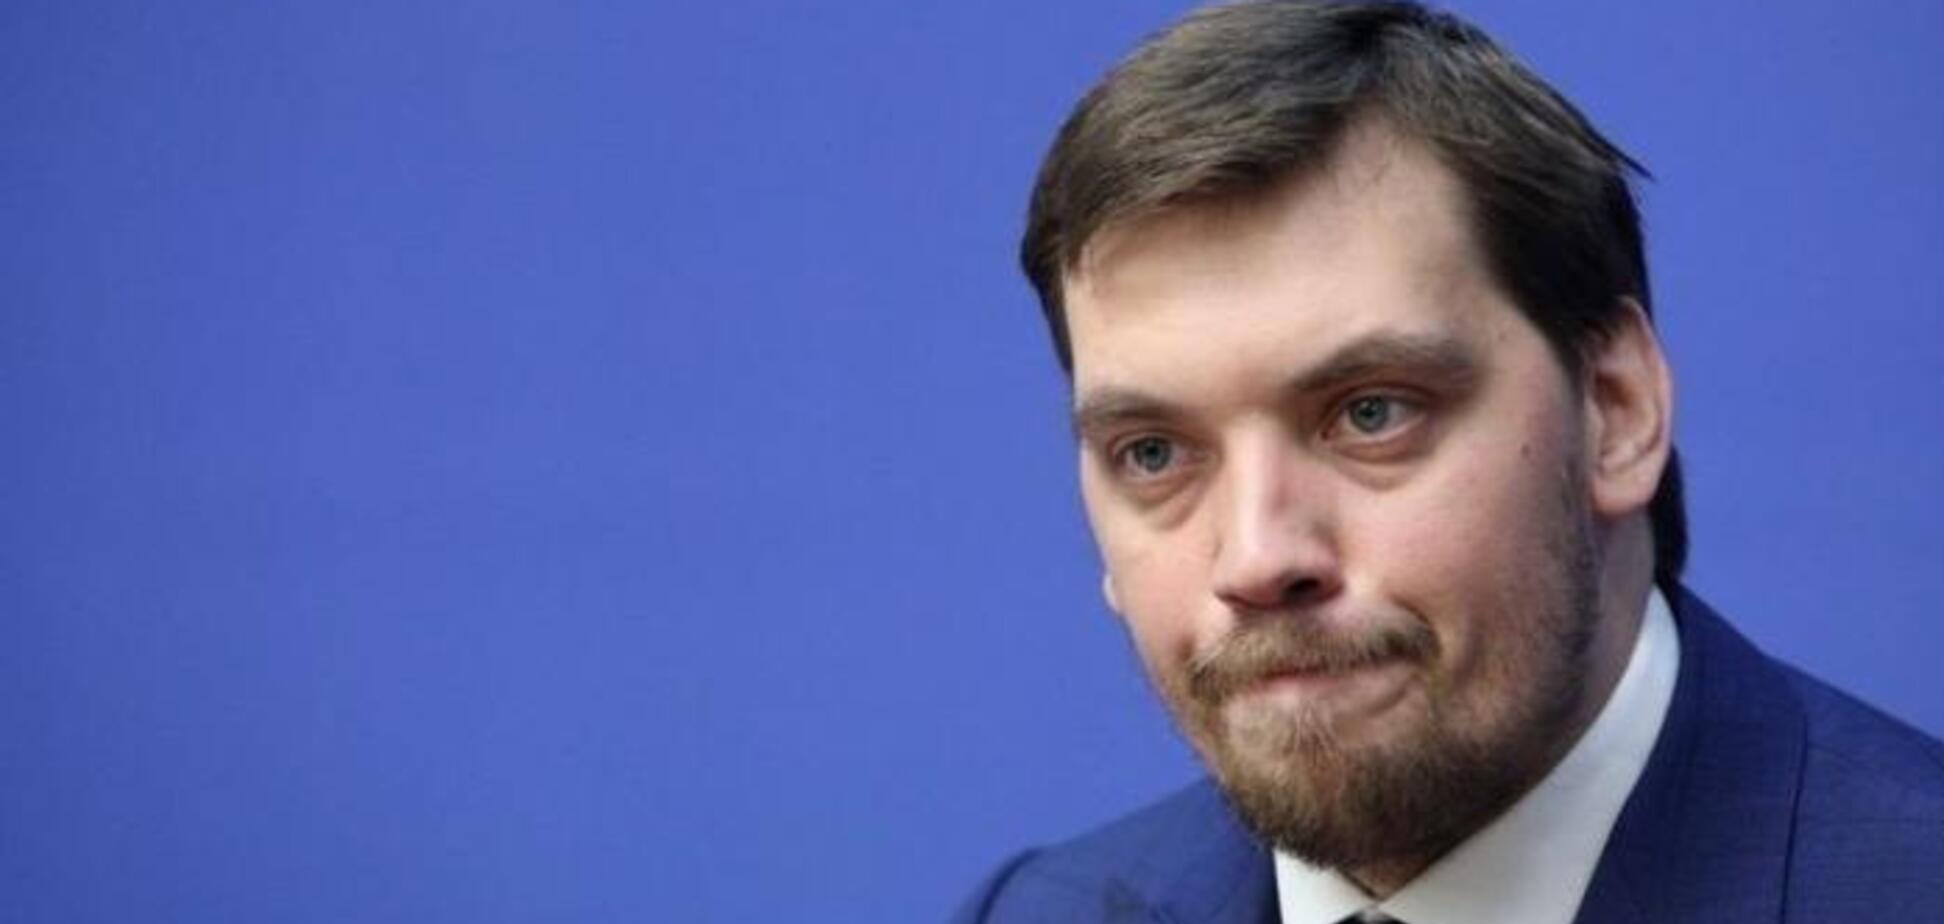 Отправят ли Гончарука в отставку: озвучен неожиданный прогноз по скандалу с пленками